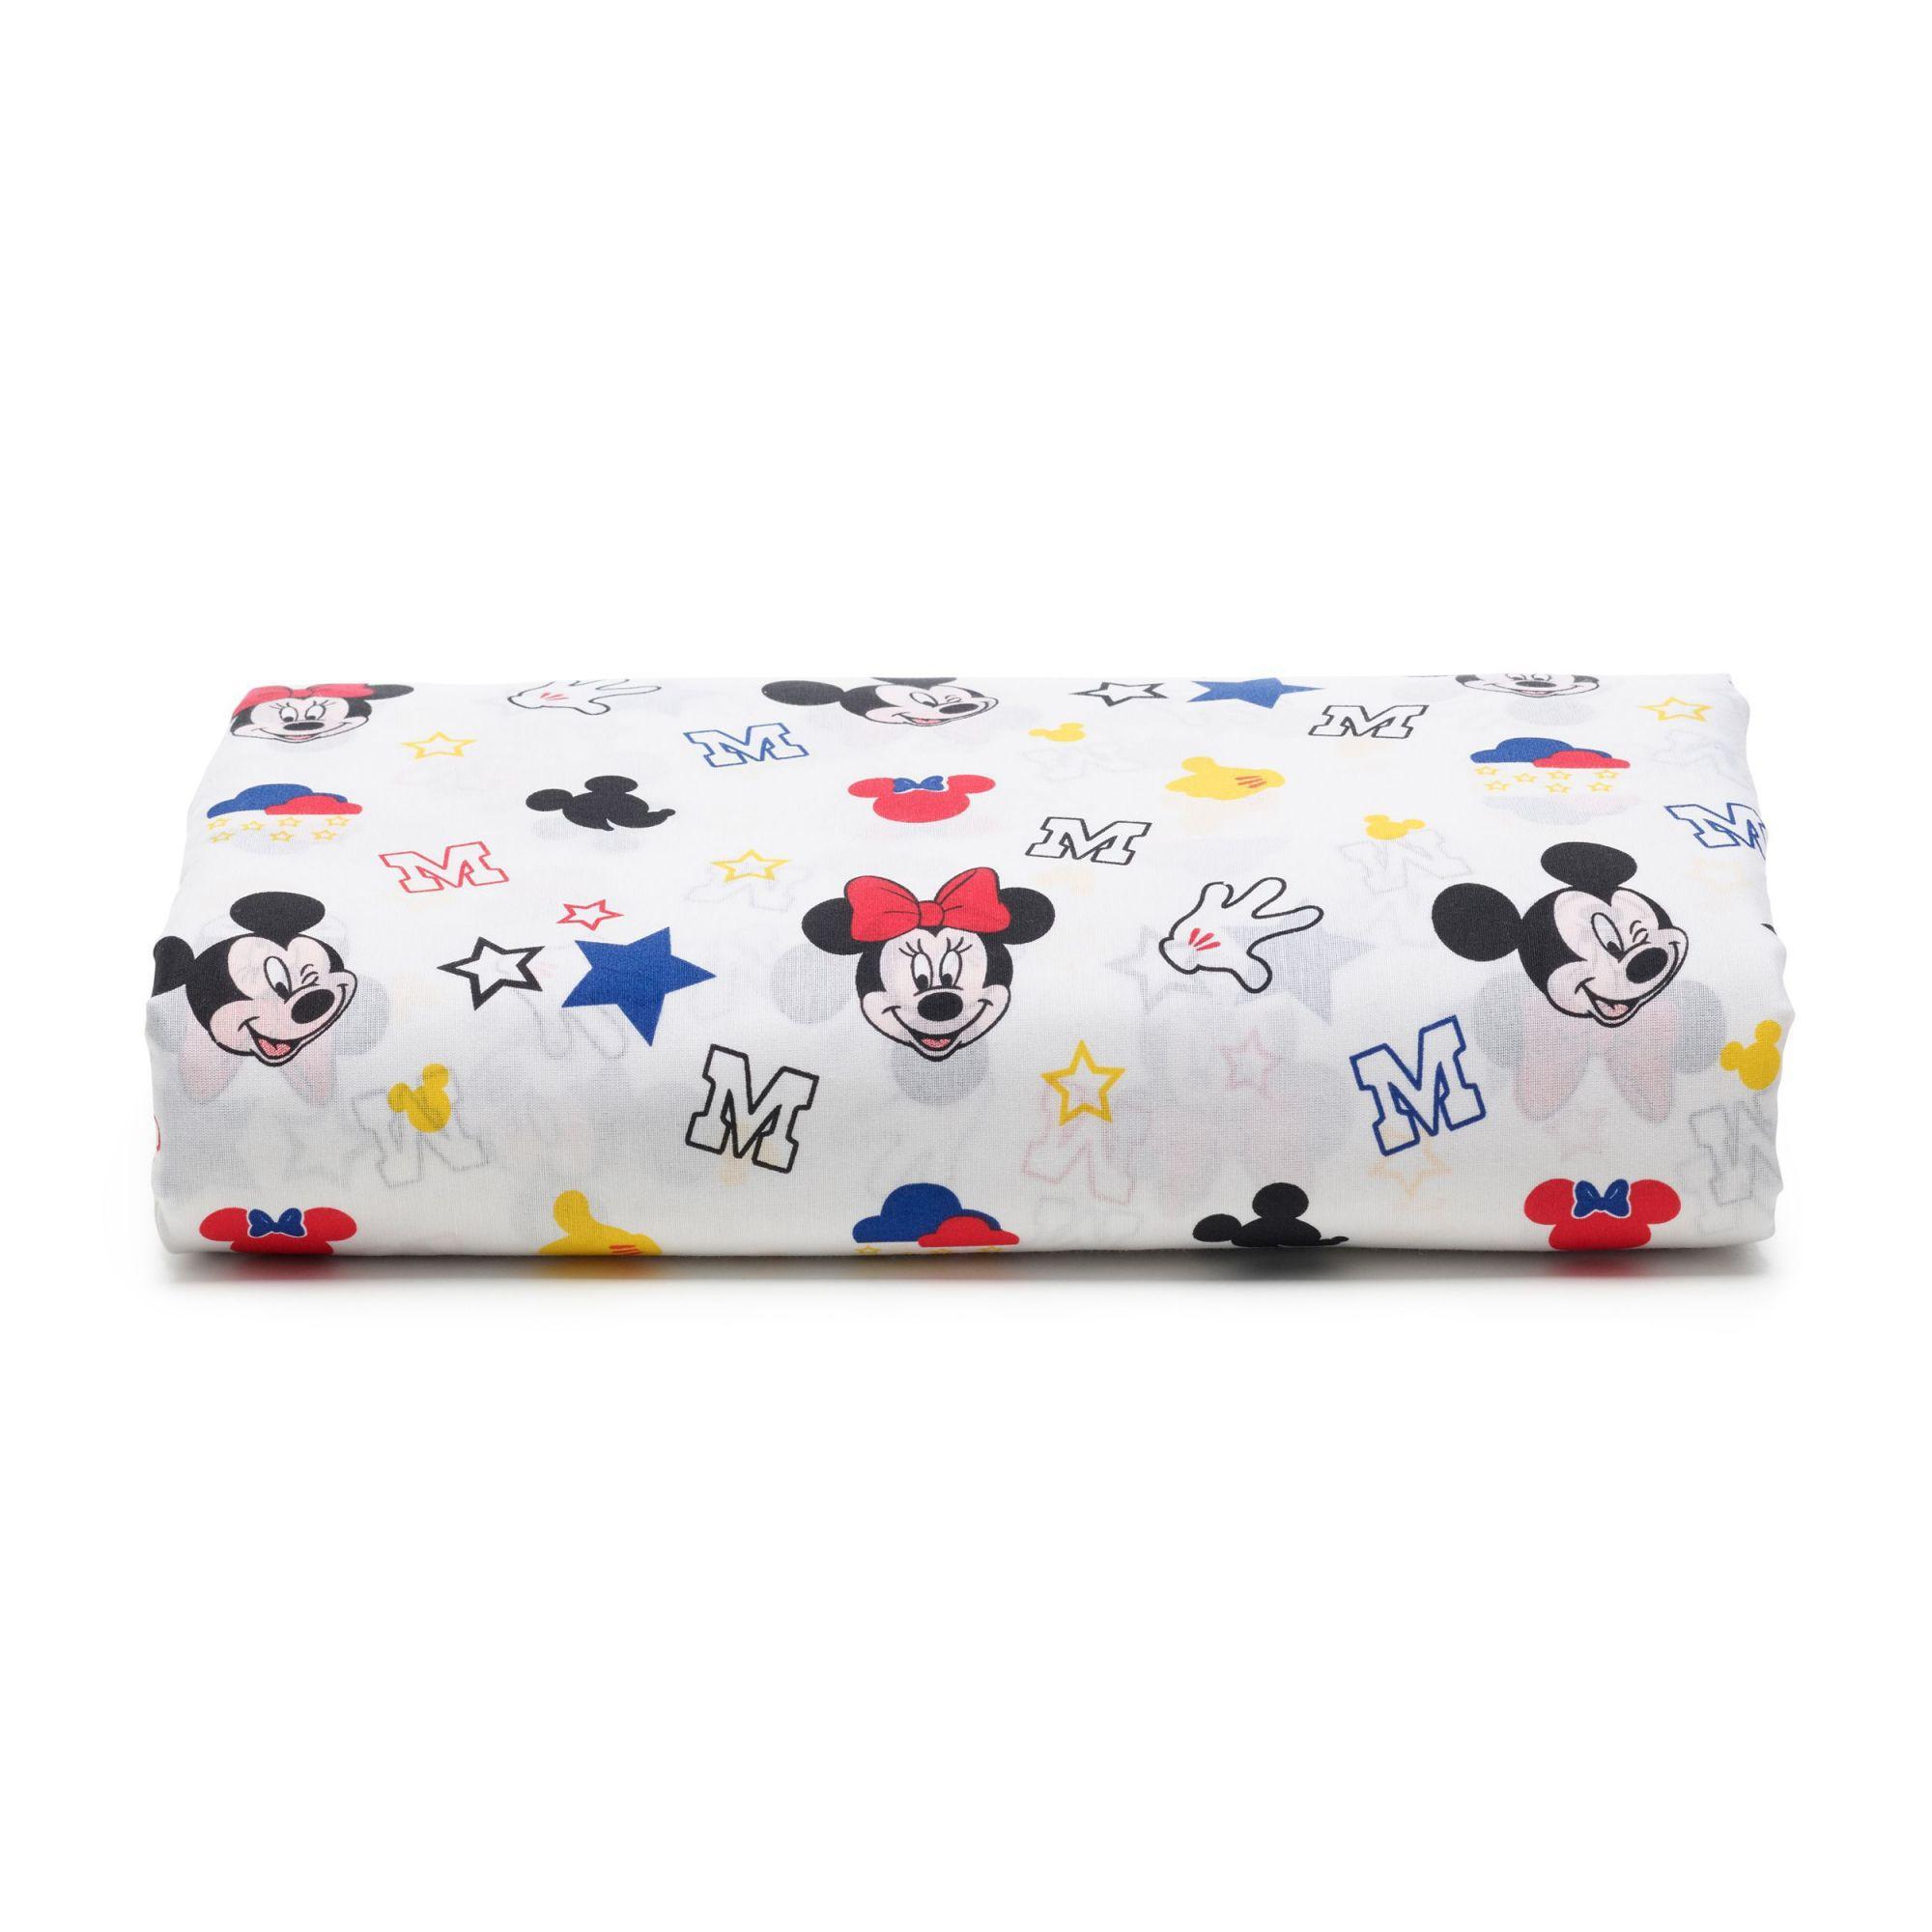 Kit 2 Lençois Infantil Mickey Play E Stick Com Elástico Santista